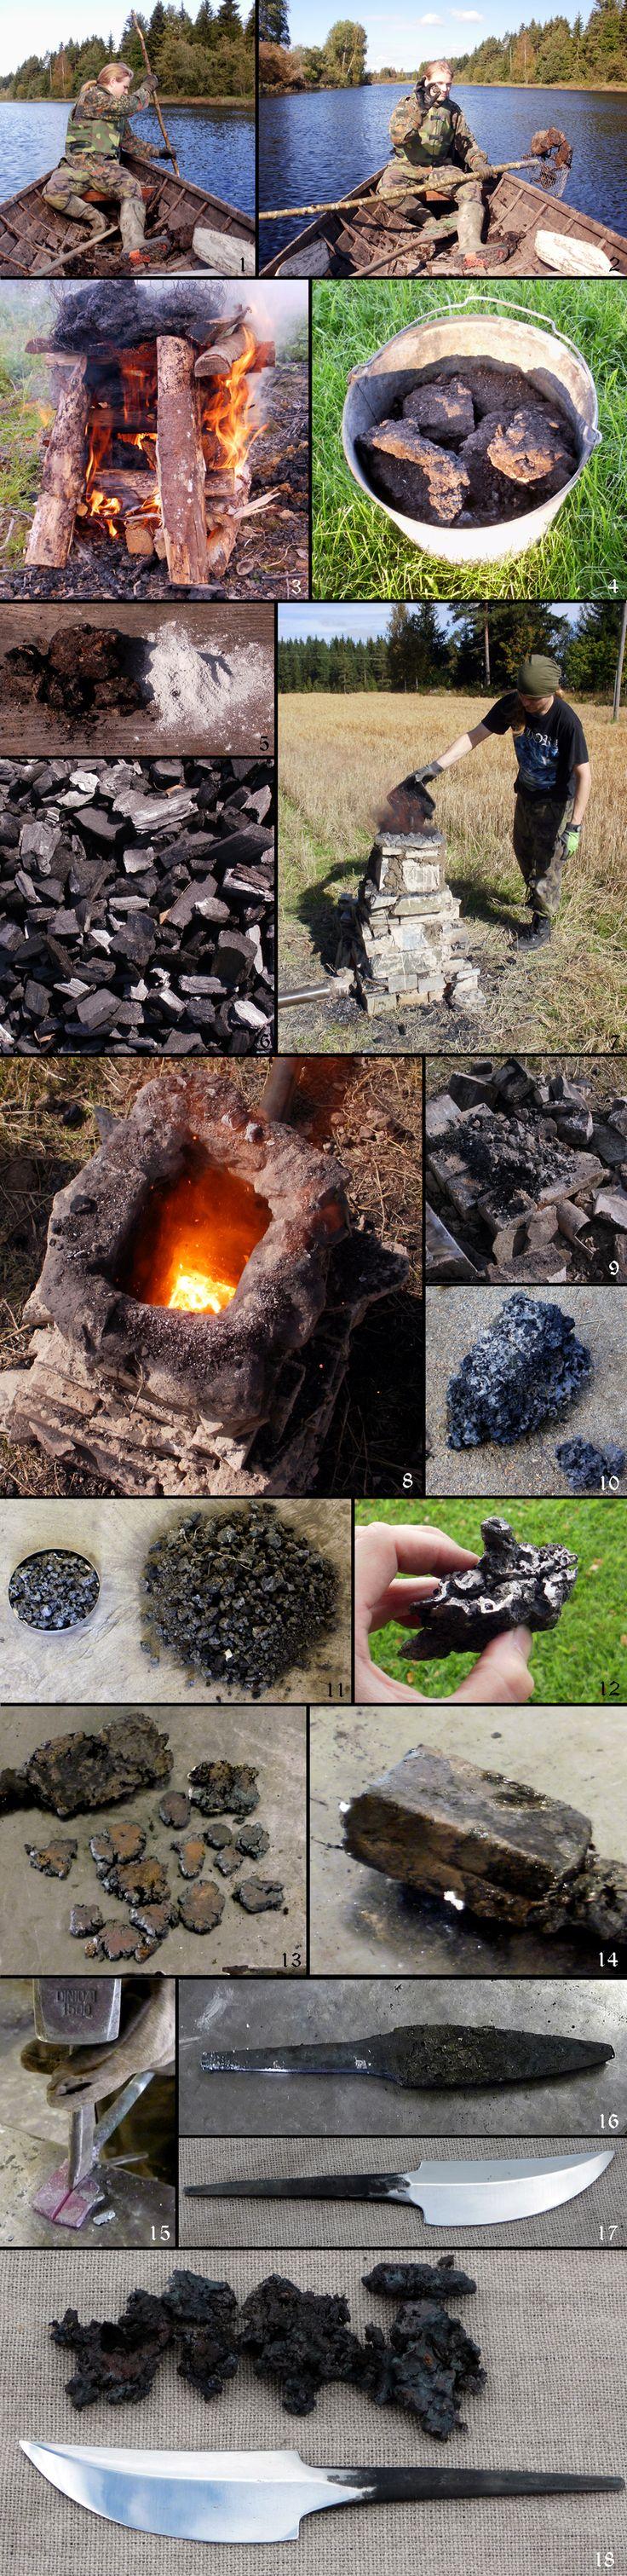 best 25 coal forge ideas on pinterest blacksmith coal homemade